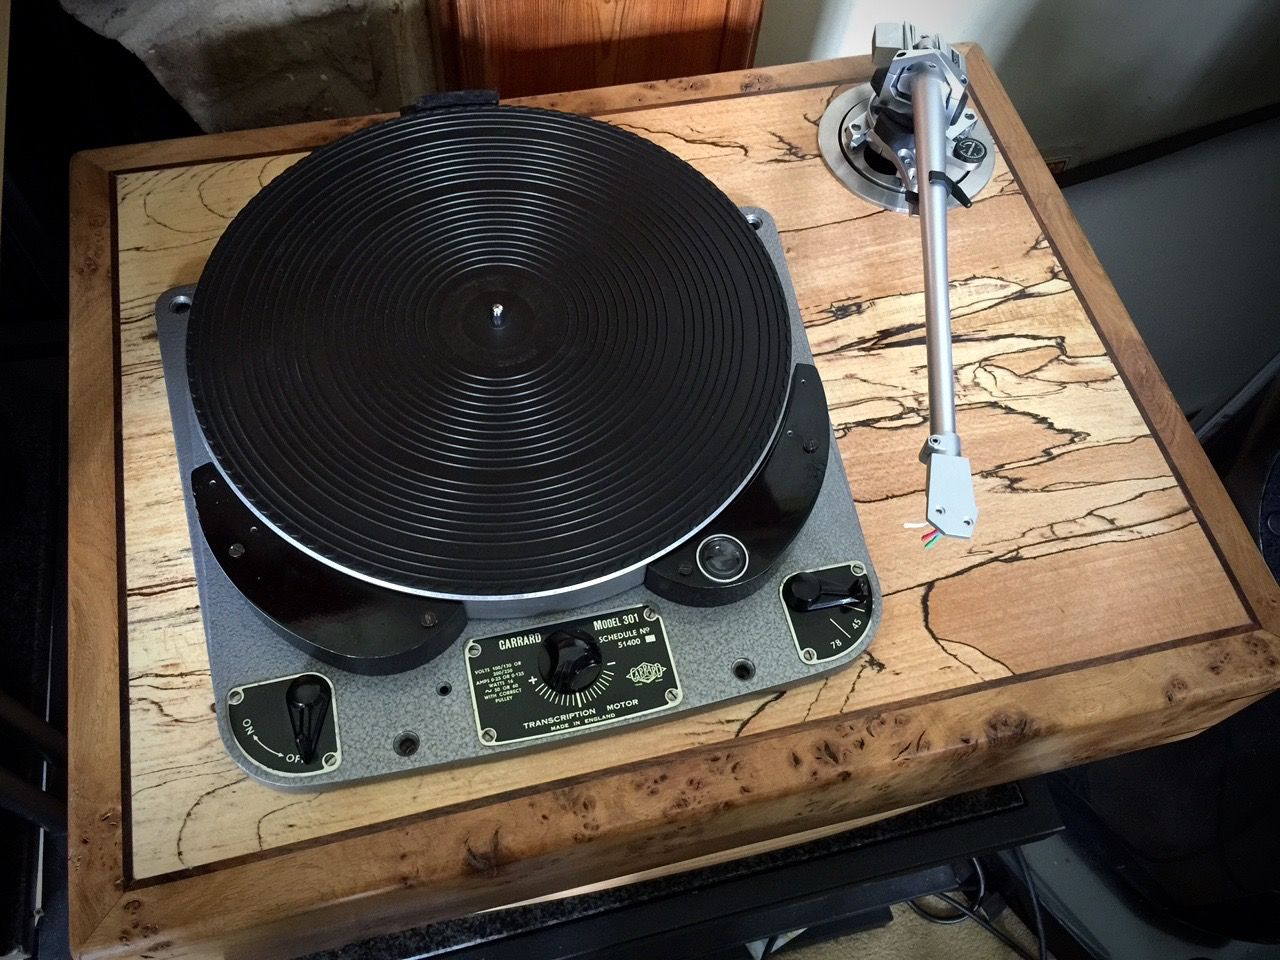 Audio Grail BBC DRD5 Garrard 301 Turntable in 'Cusworth